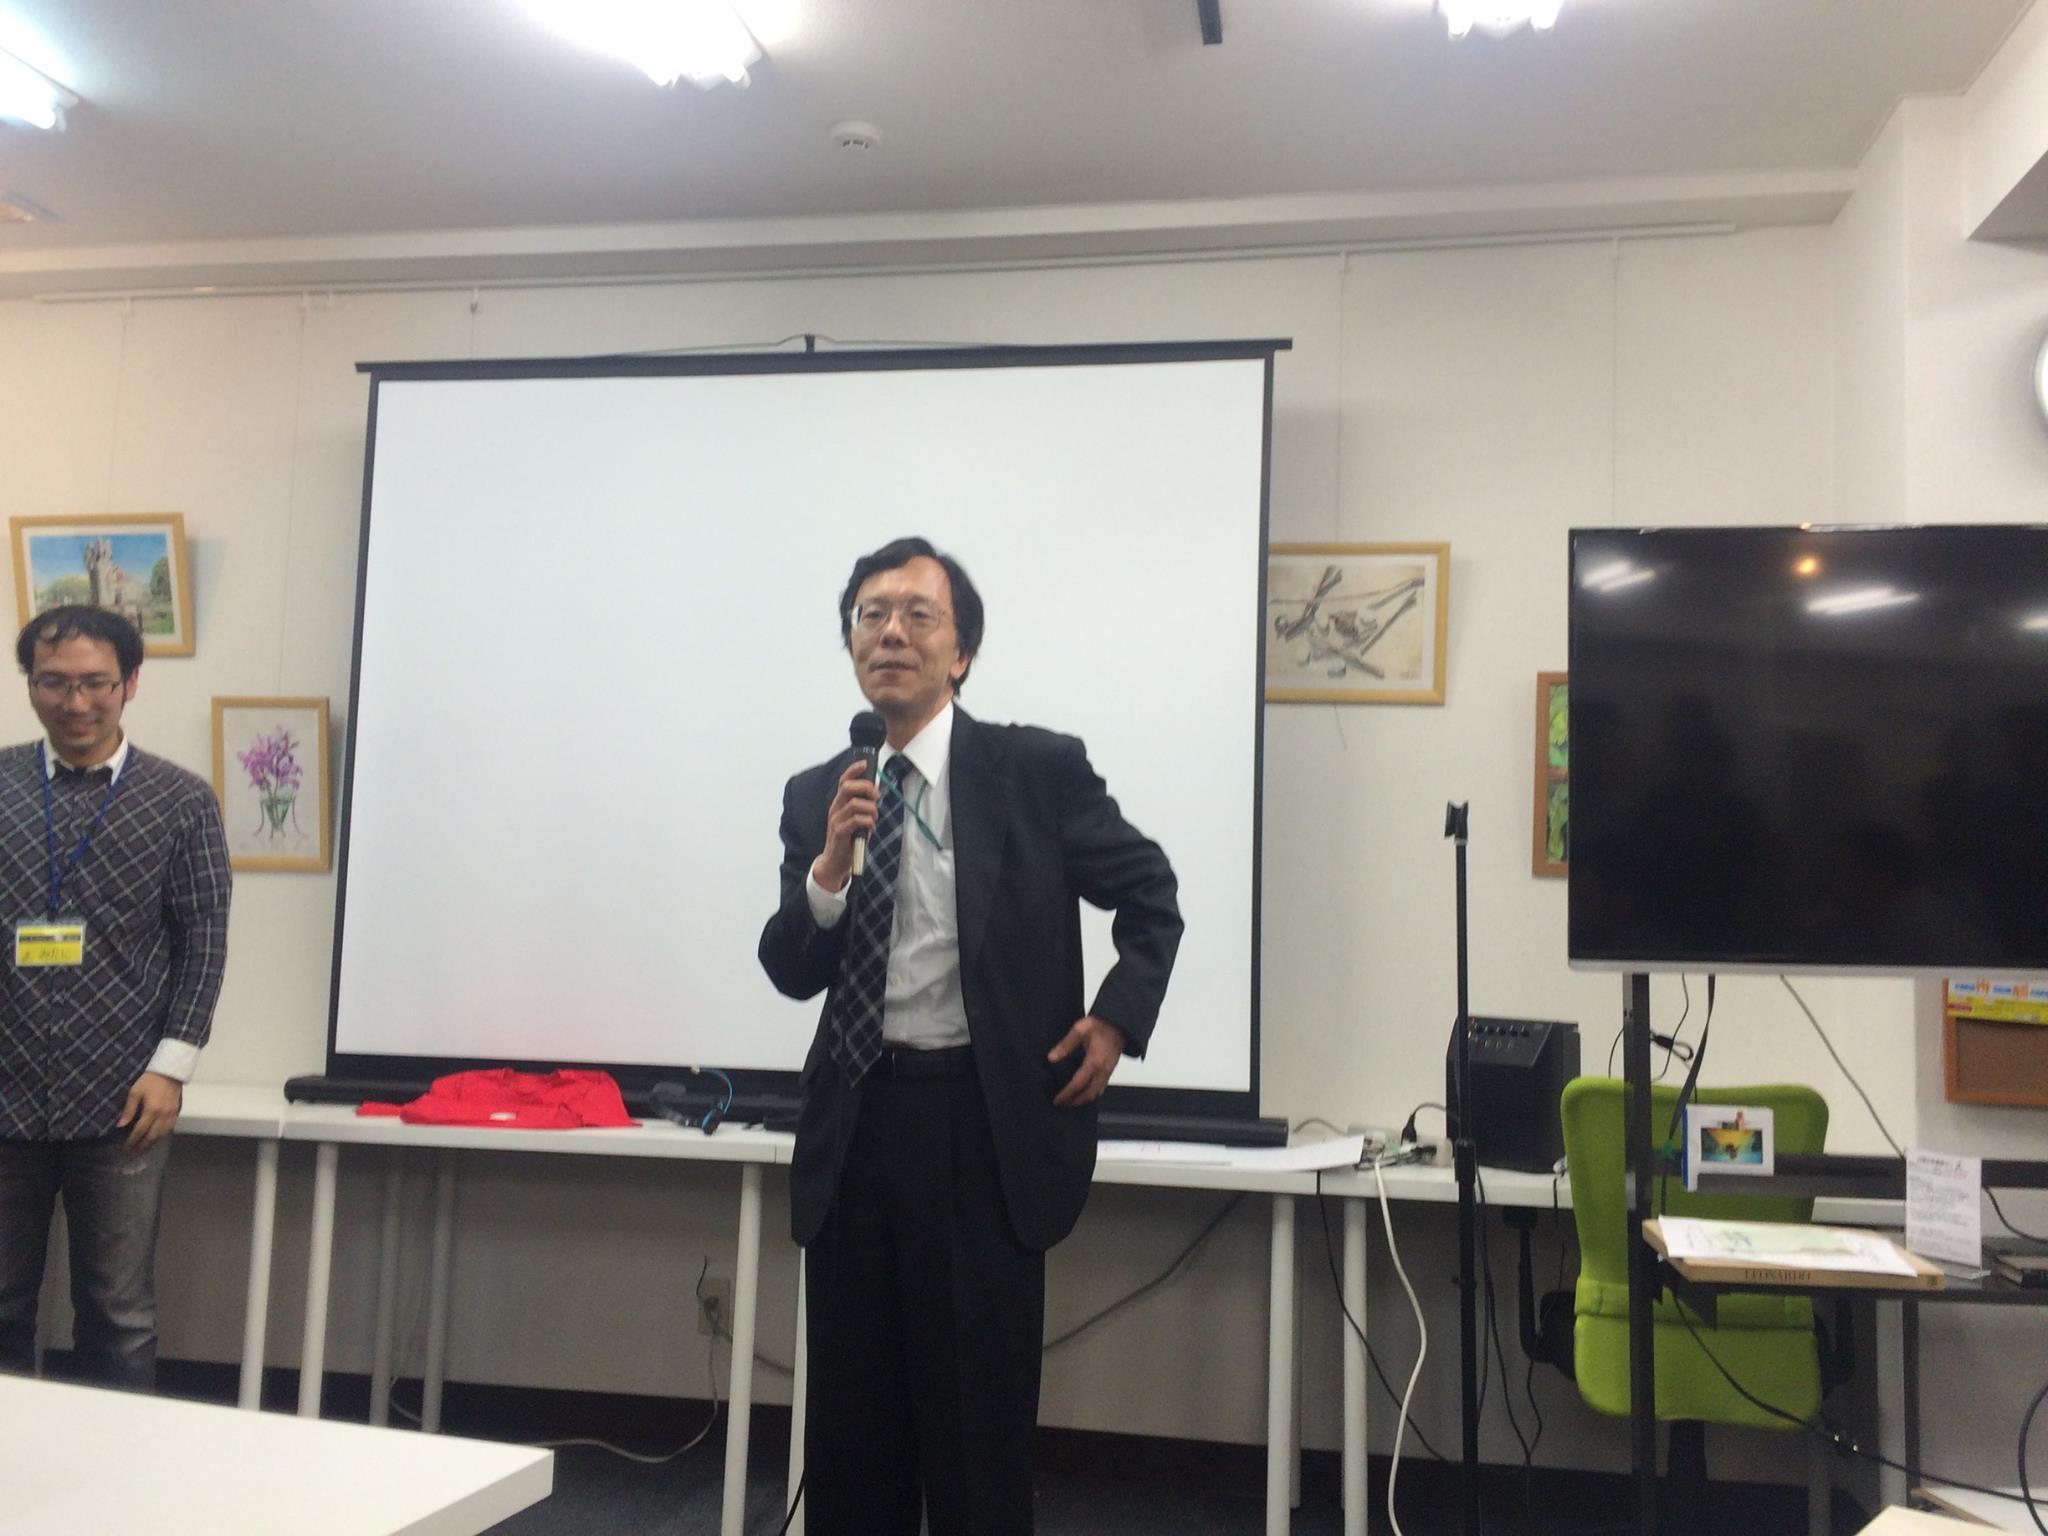 経済産業省関東経済局情報政策課課長の久世氏の講評